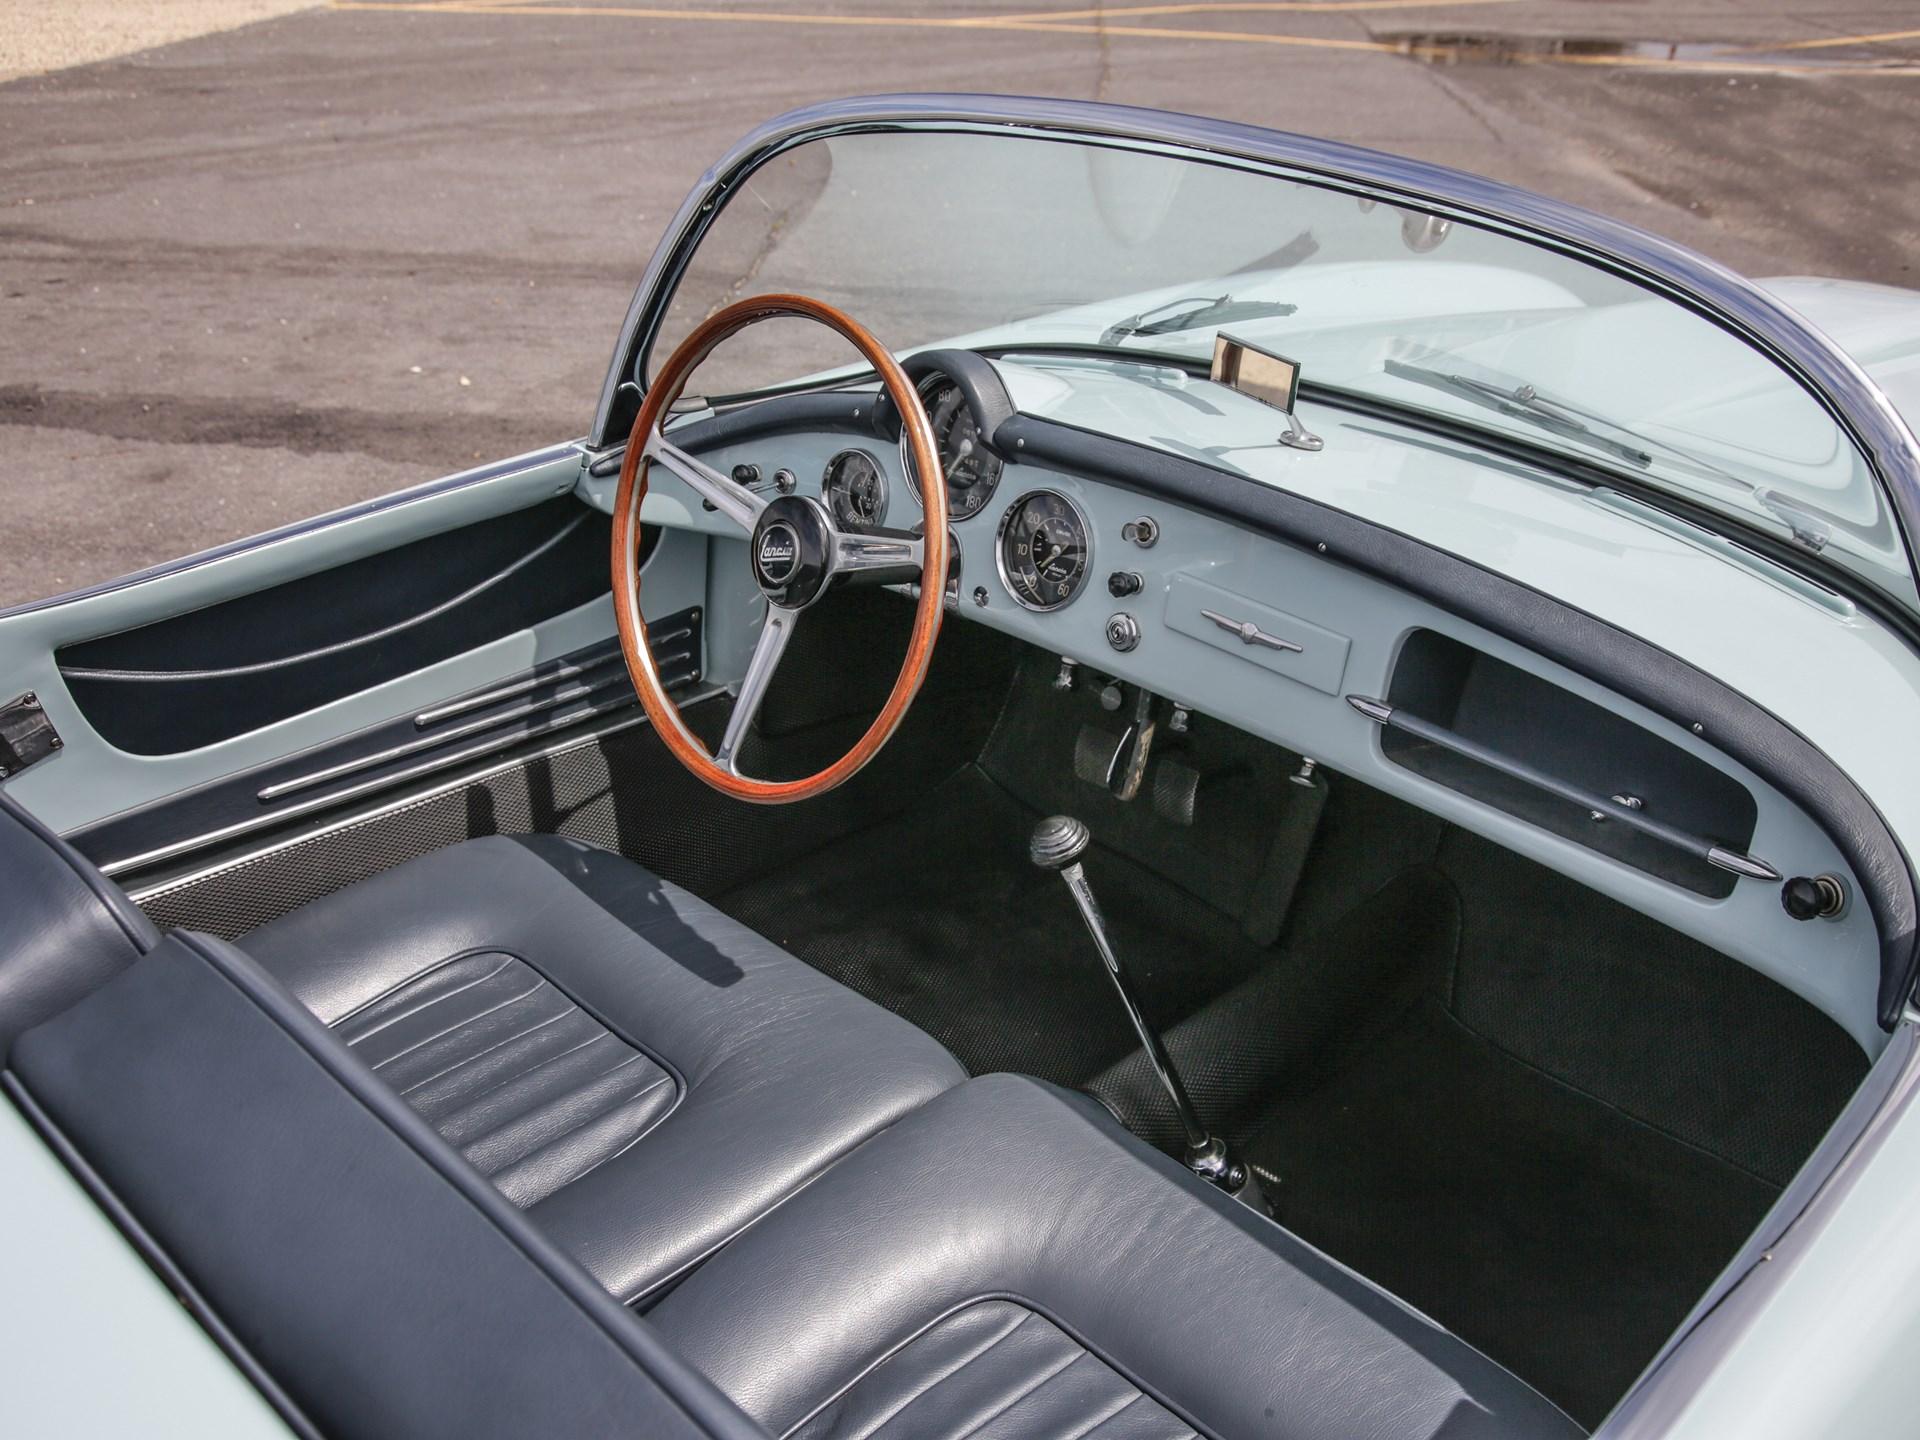 1955 Lancia Aurelia B24S Spider America by Pinin Farina